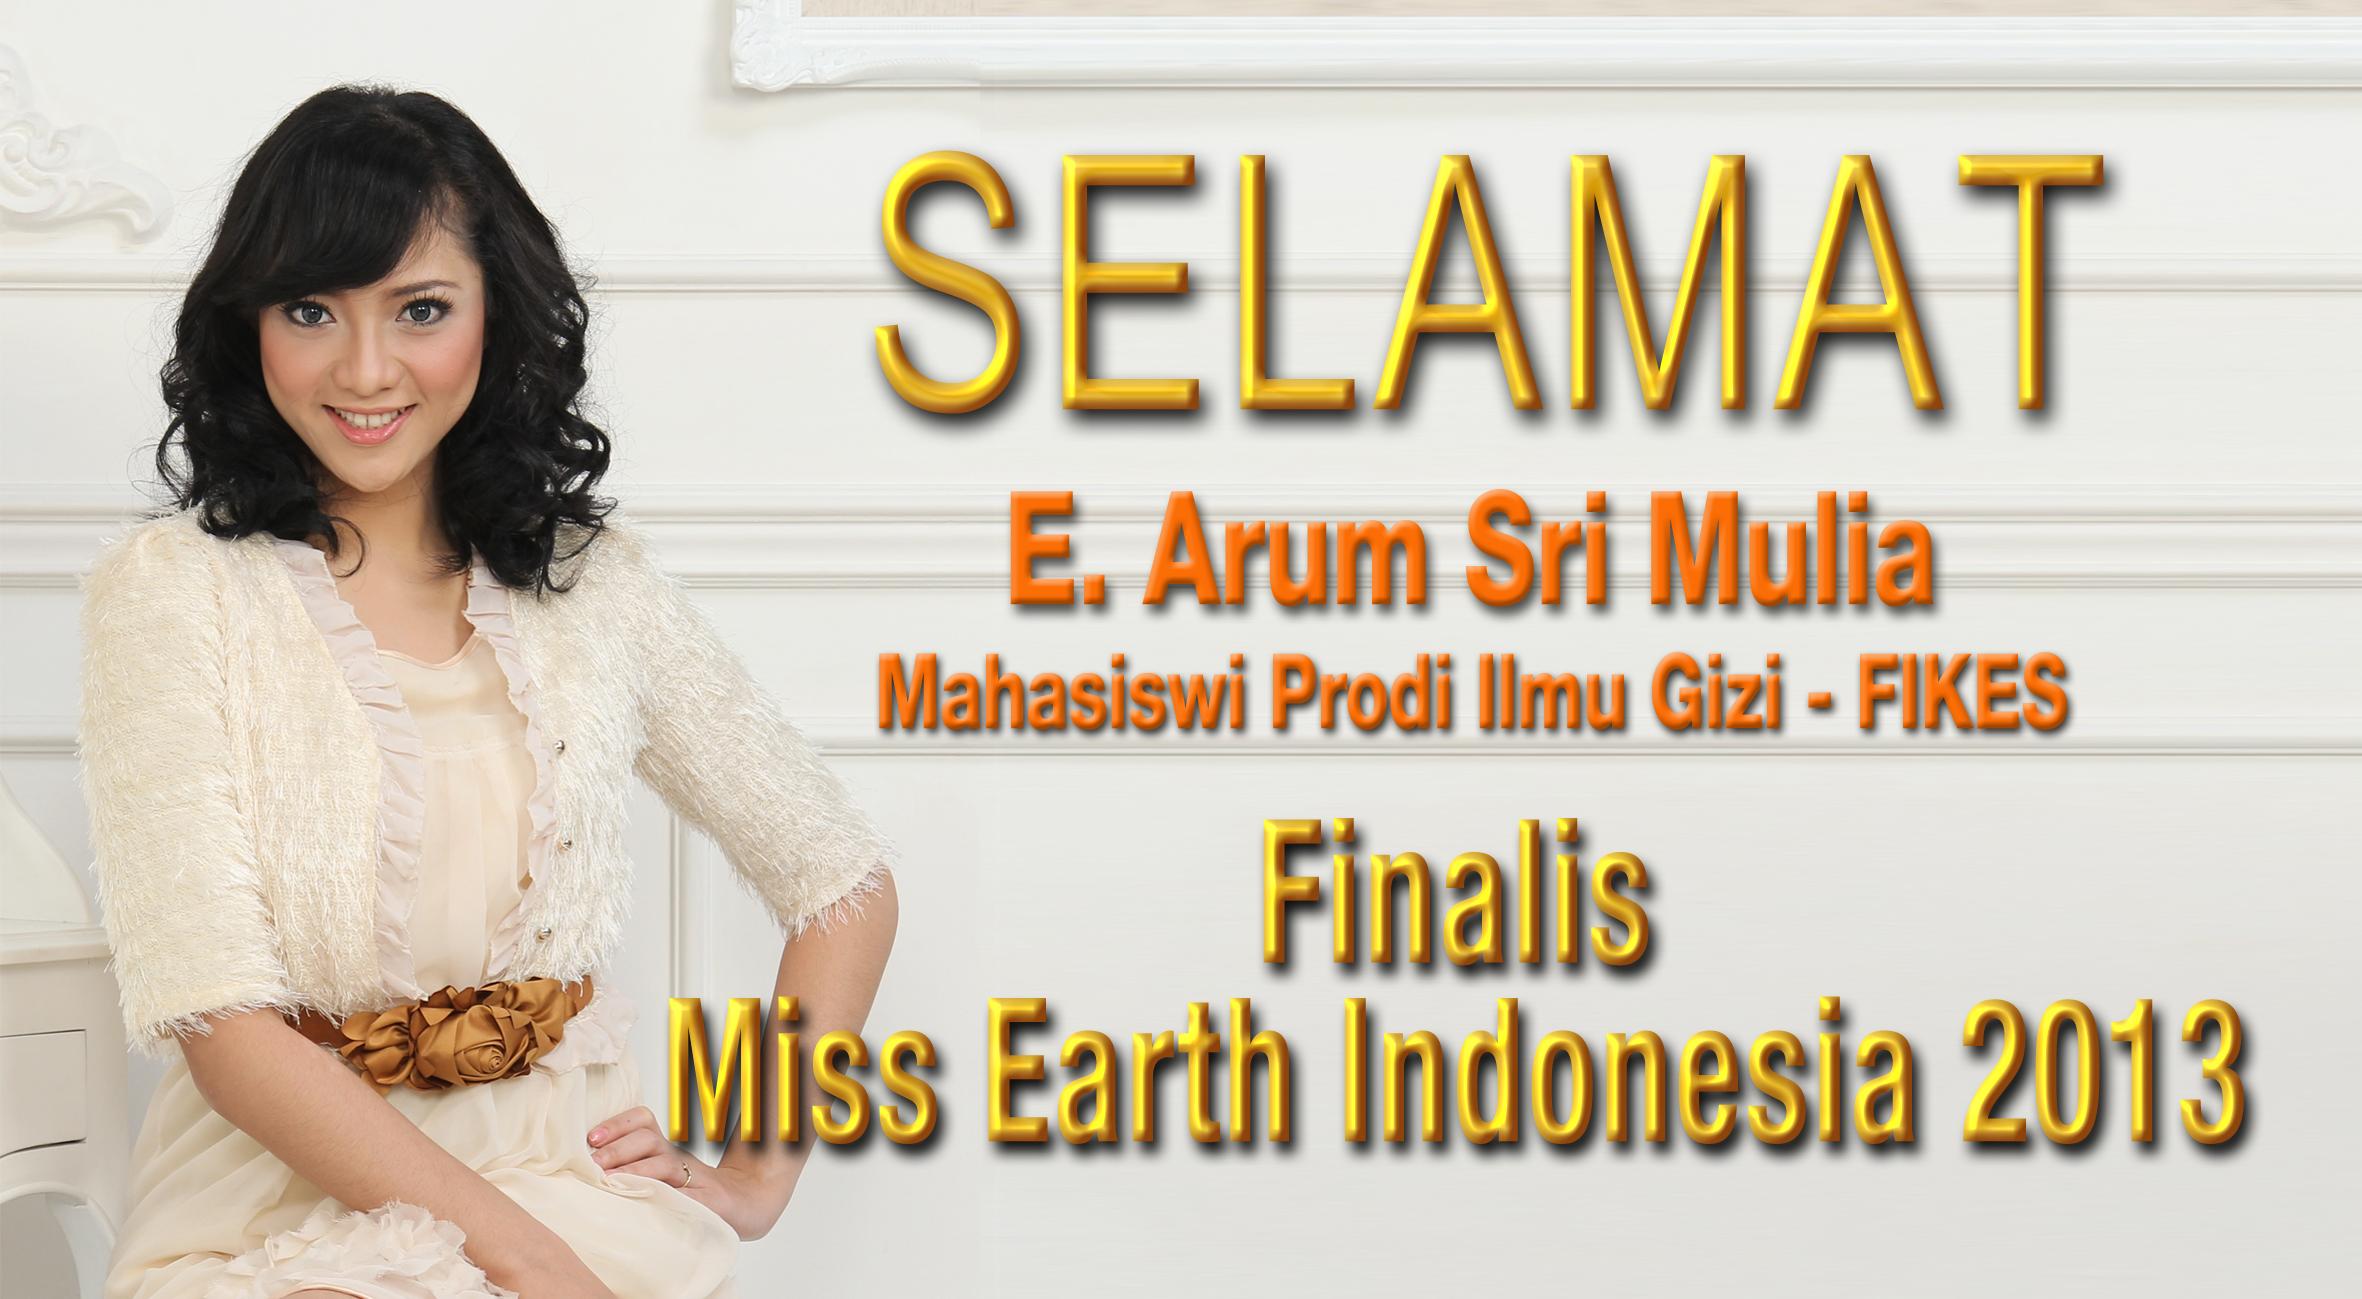 "Universitas Esa Unggul mengucapkan Selamat kepada E. Arum Sri Mulia (Mahasiswi Prodi. Ilmu Gizi – FIKES) menjadi ""Finalis Miss Earth Indonesia 2013"""